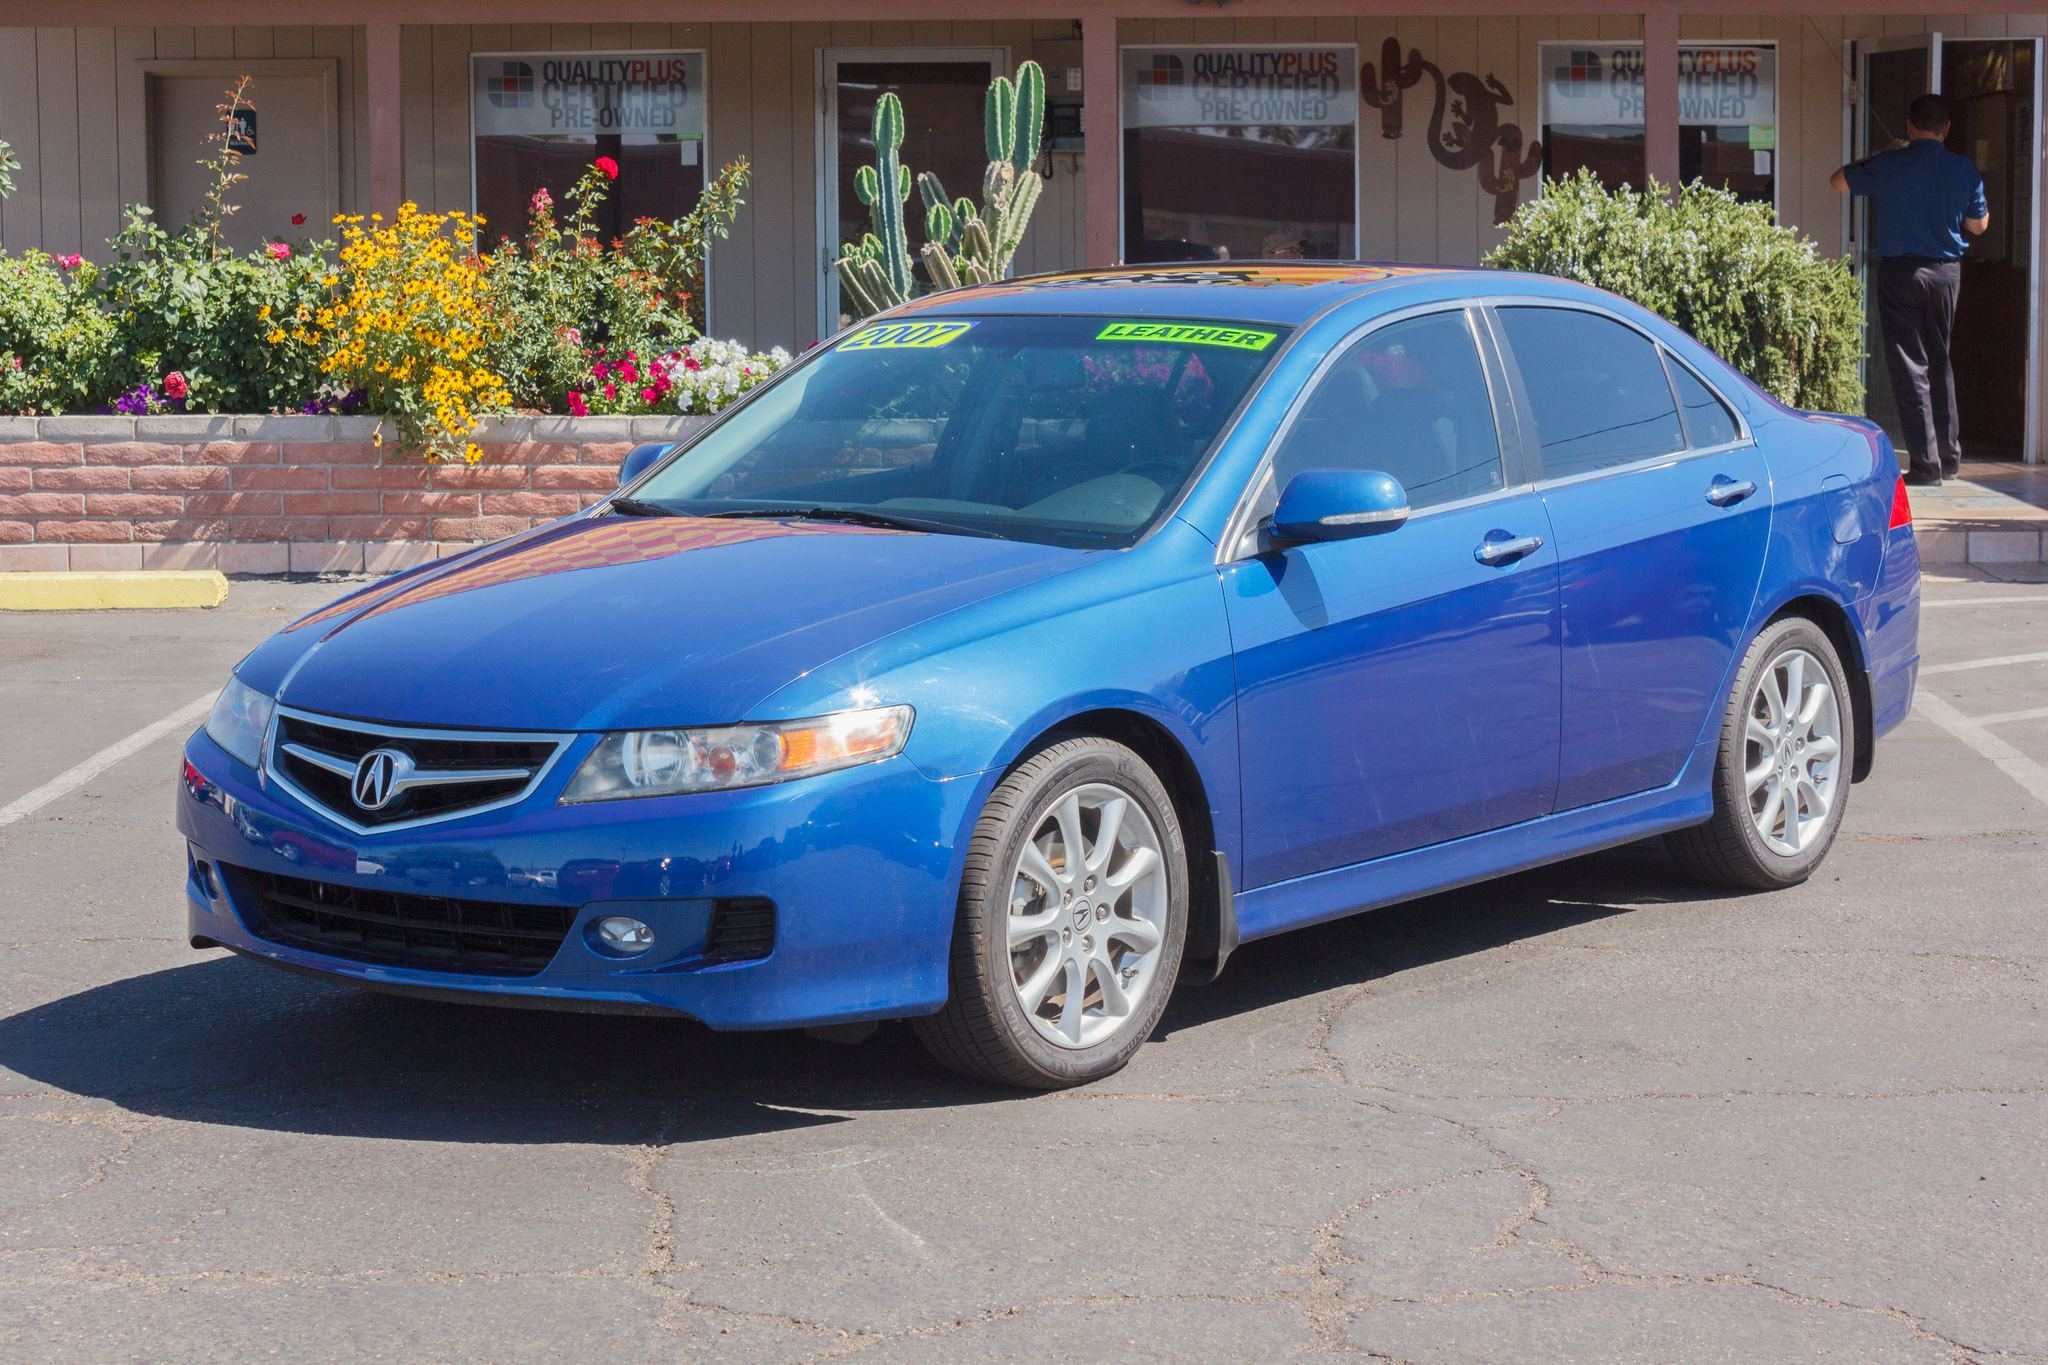 Photo of 2007 Acura TSX 4d Sedan Auto Glacier Blue Metallic